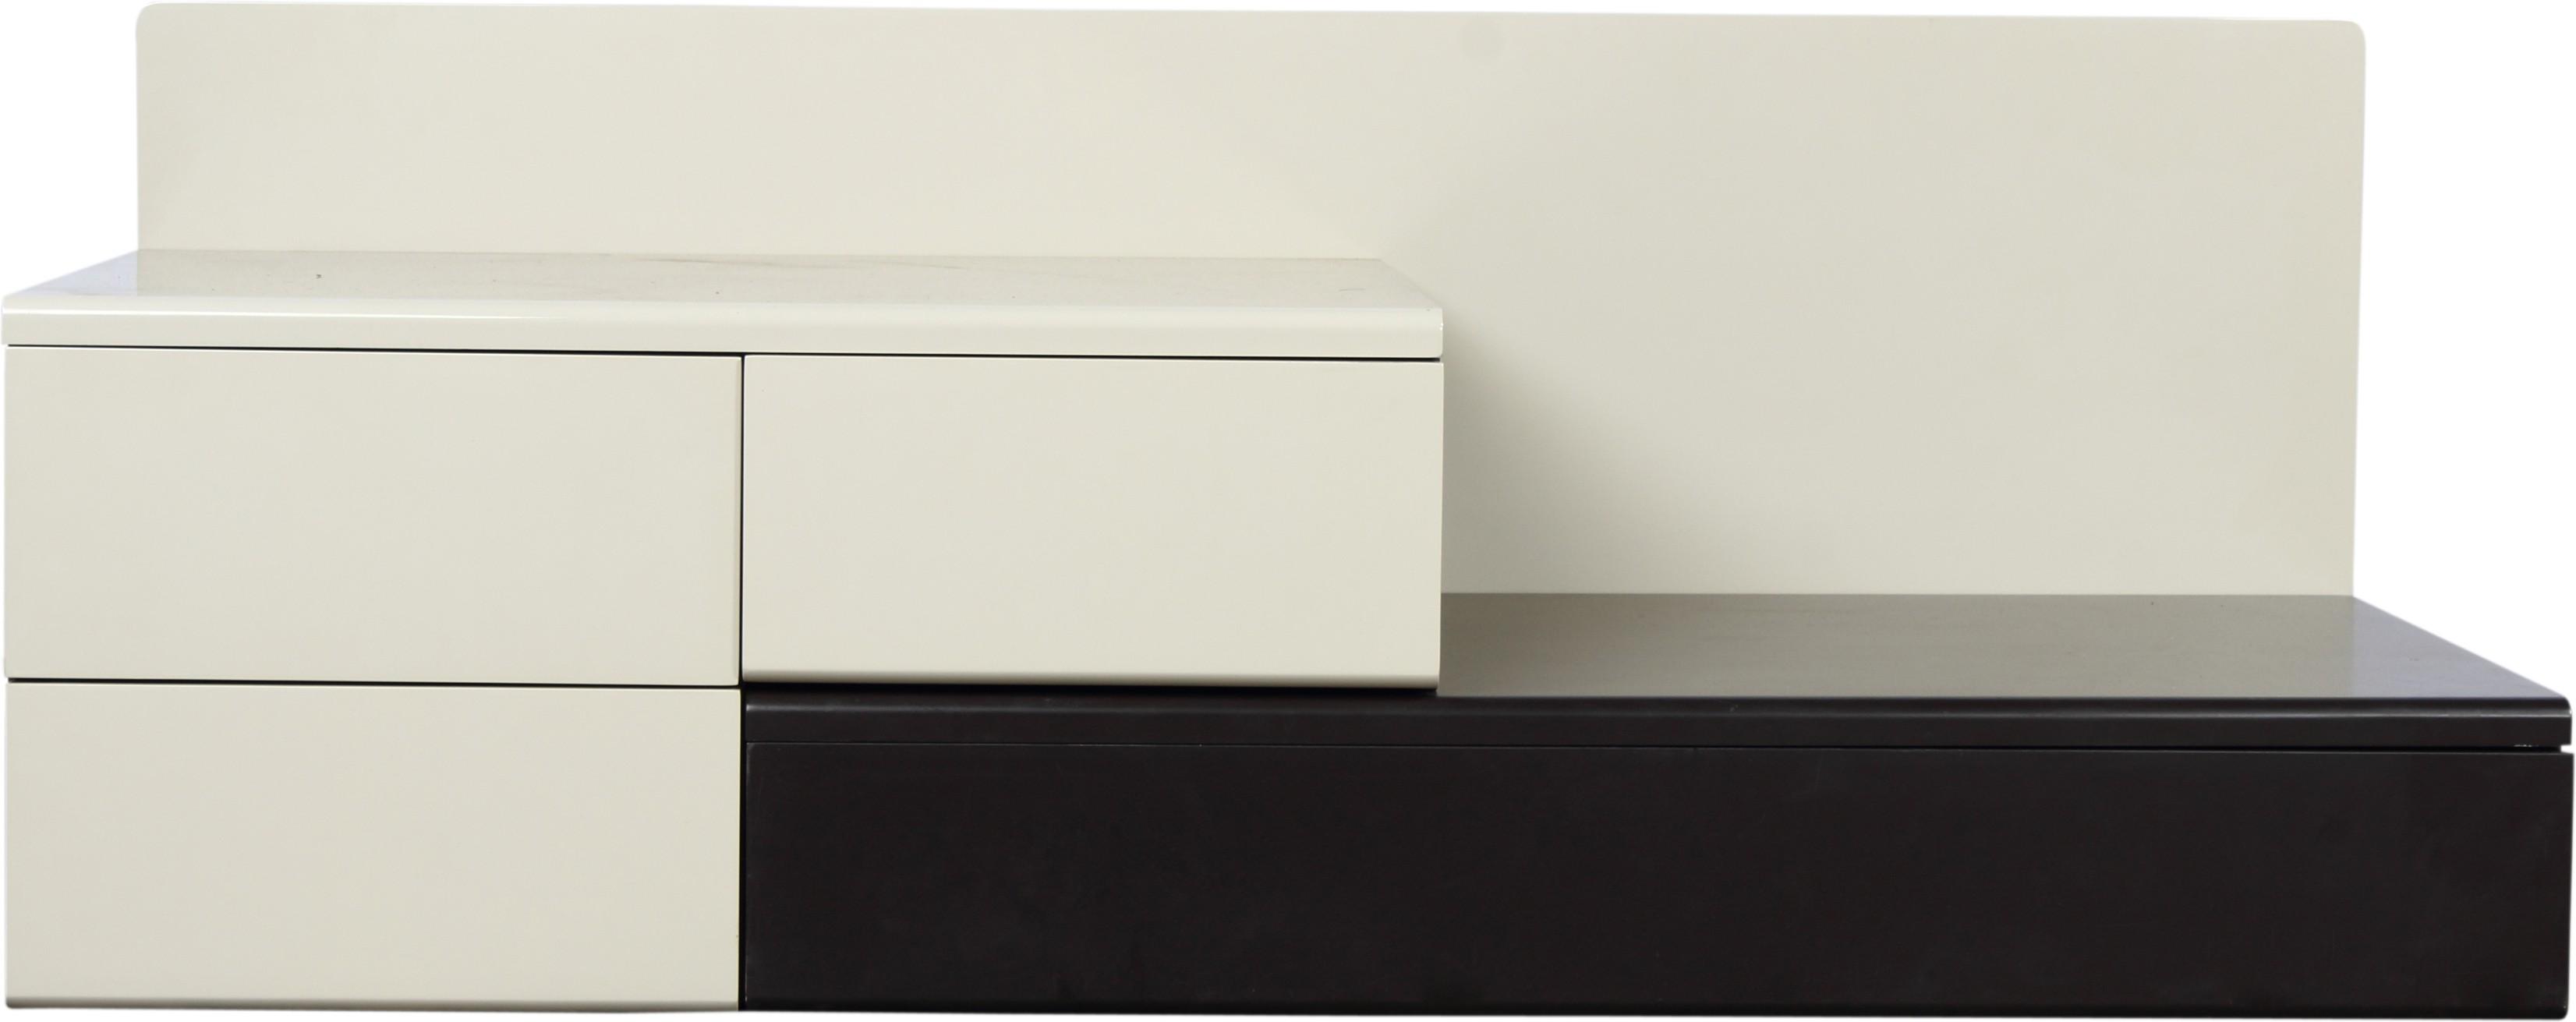 Godrej Interio Flute Engineered Wood TV Entertainment Unit(Finish Color - White)